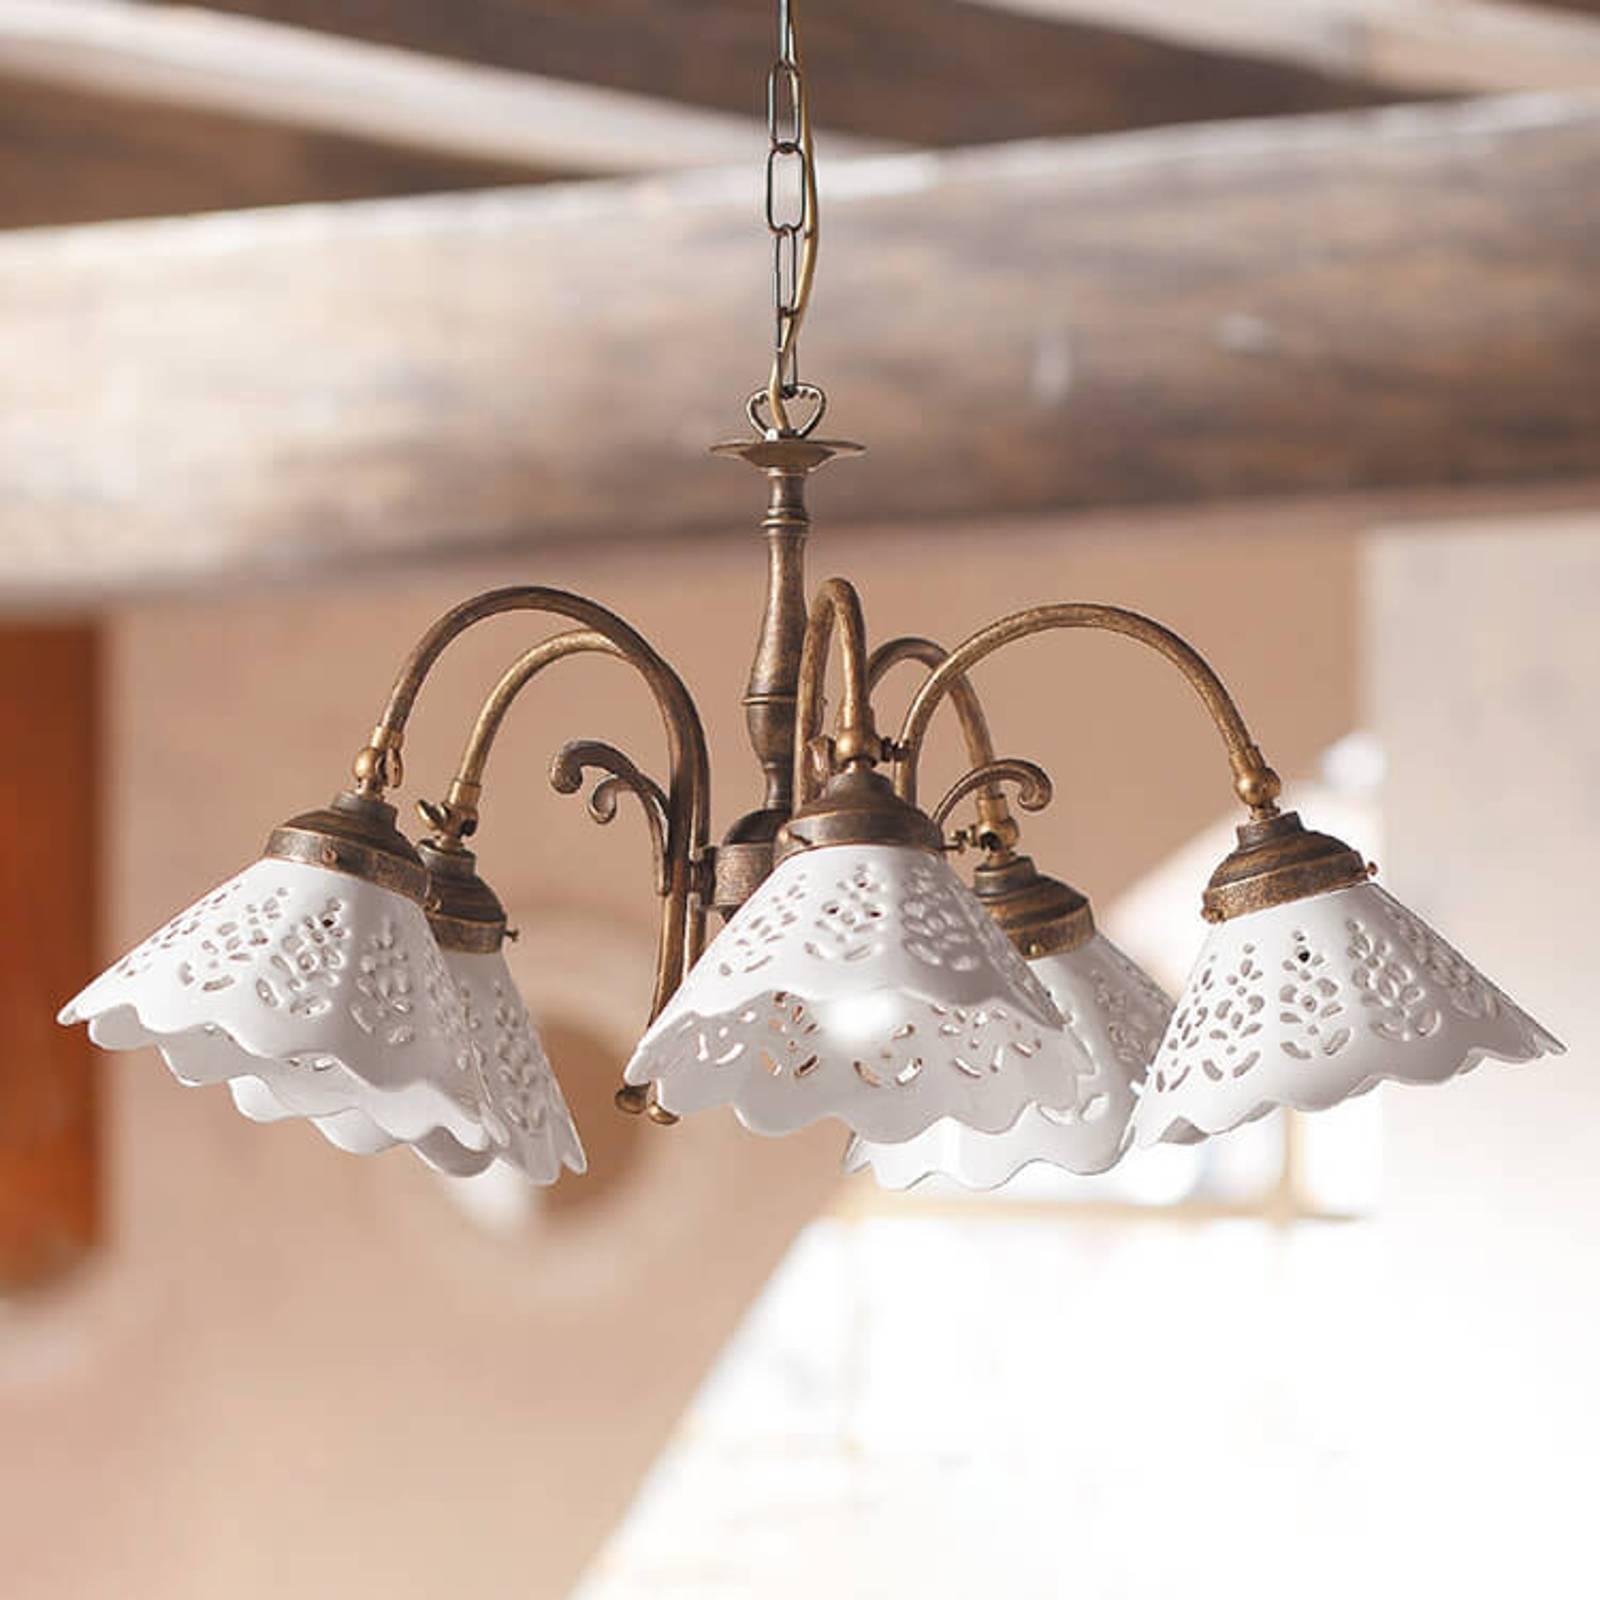 Hanglamp Semino m keramiek lampenkap, m 5 lampjes